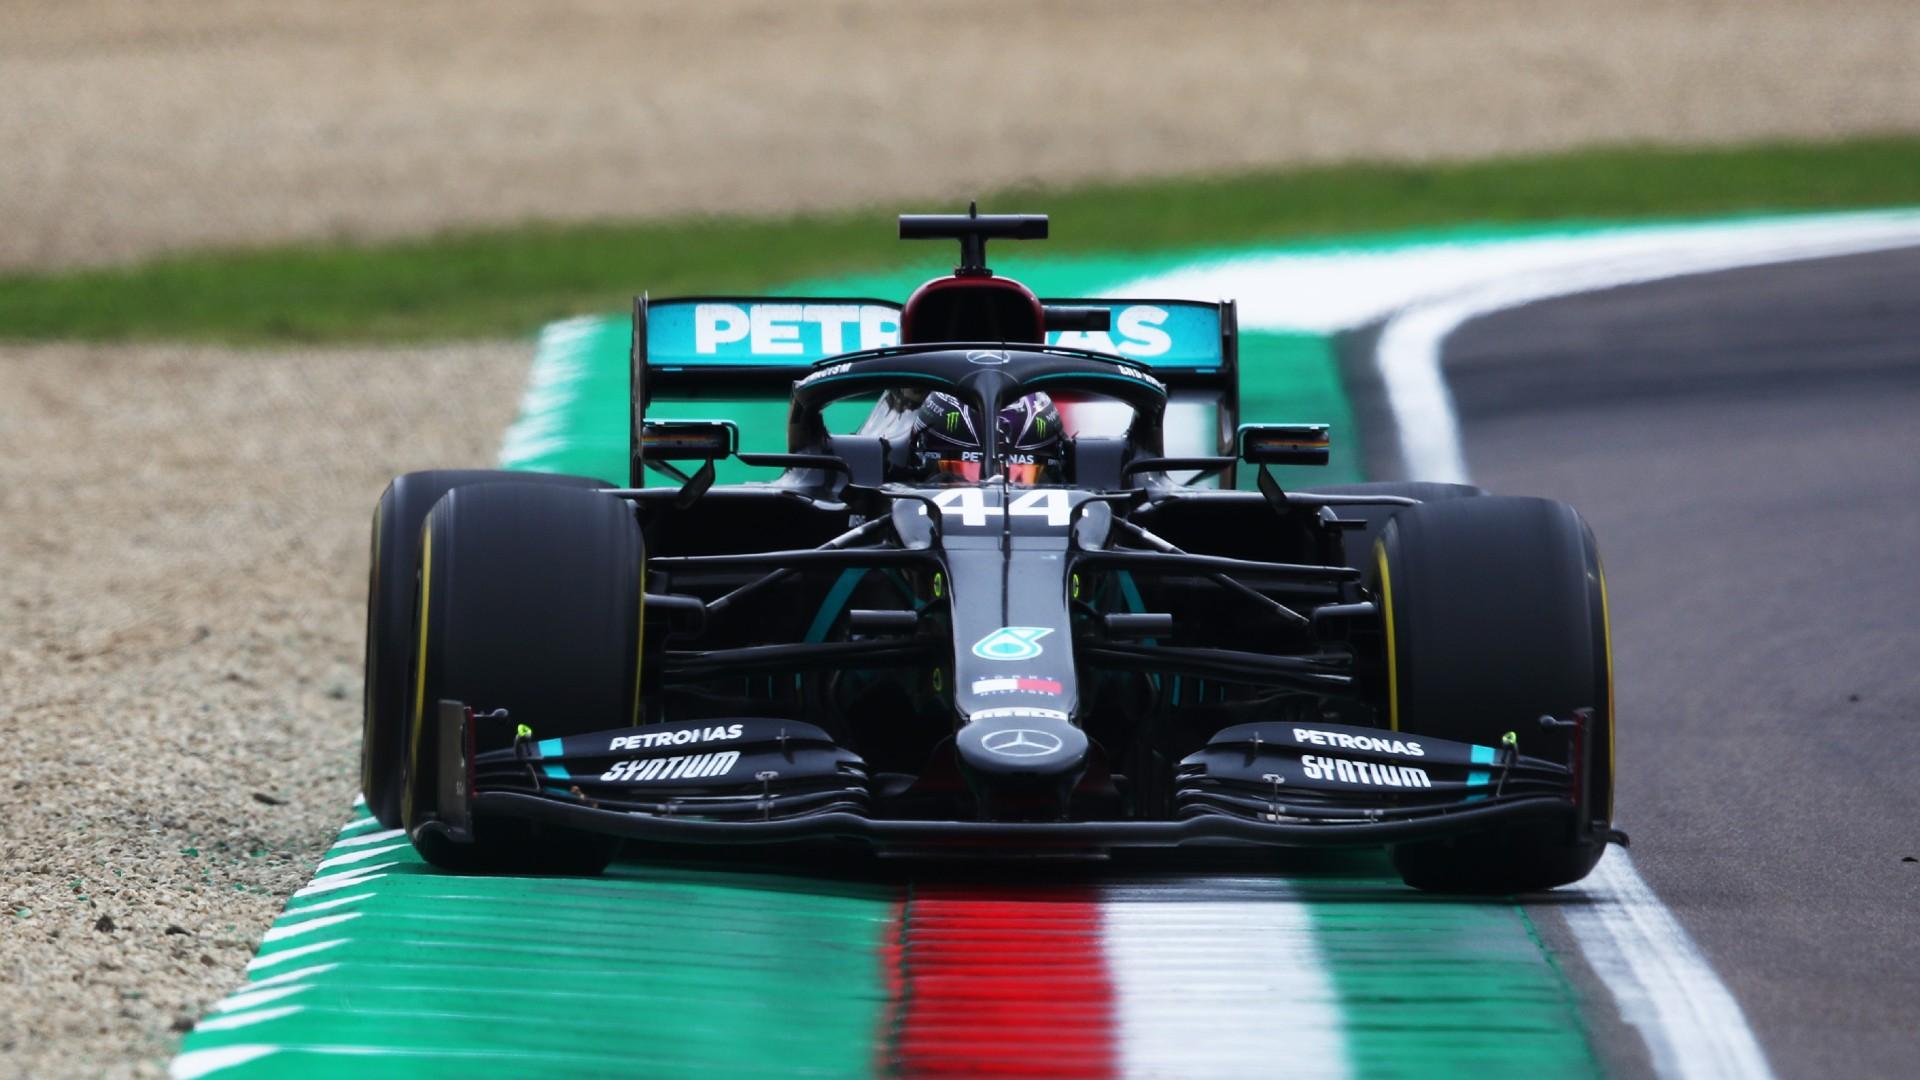 Formula 1 qualifying results: Starting grid for 2021 Emilia Romagna Grand Prix at Imola